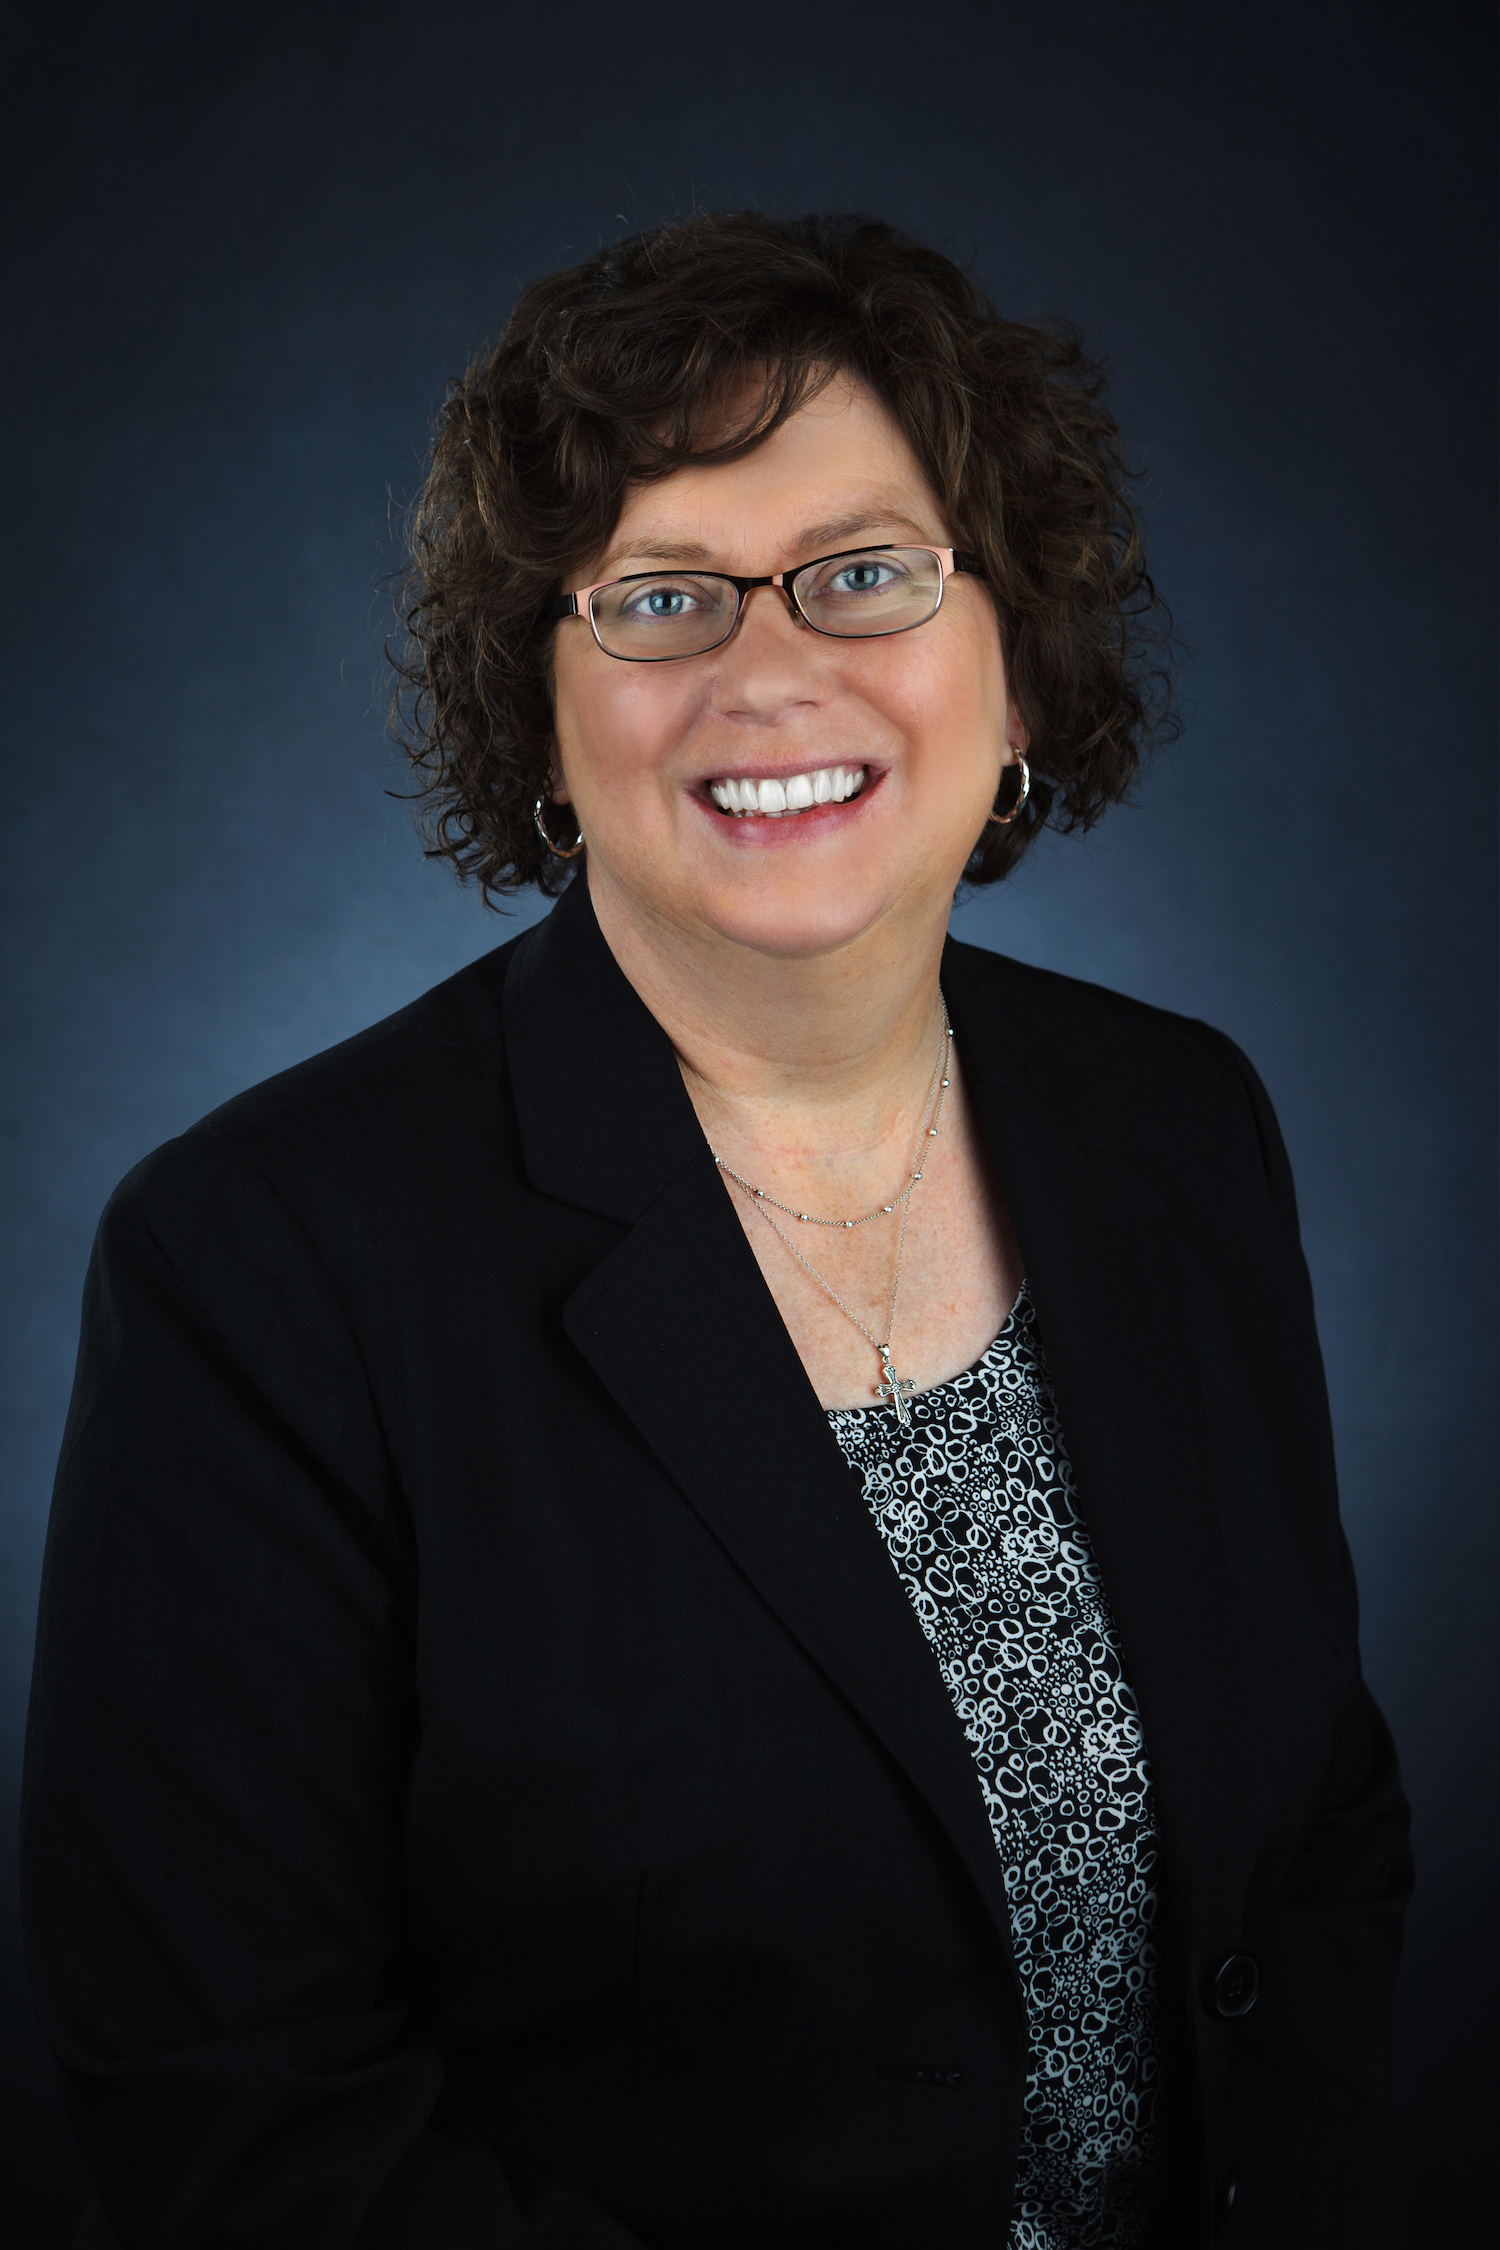 Visit Profile of Cynthia Schmidt